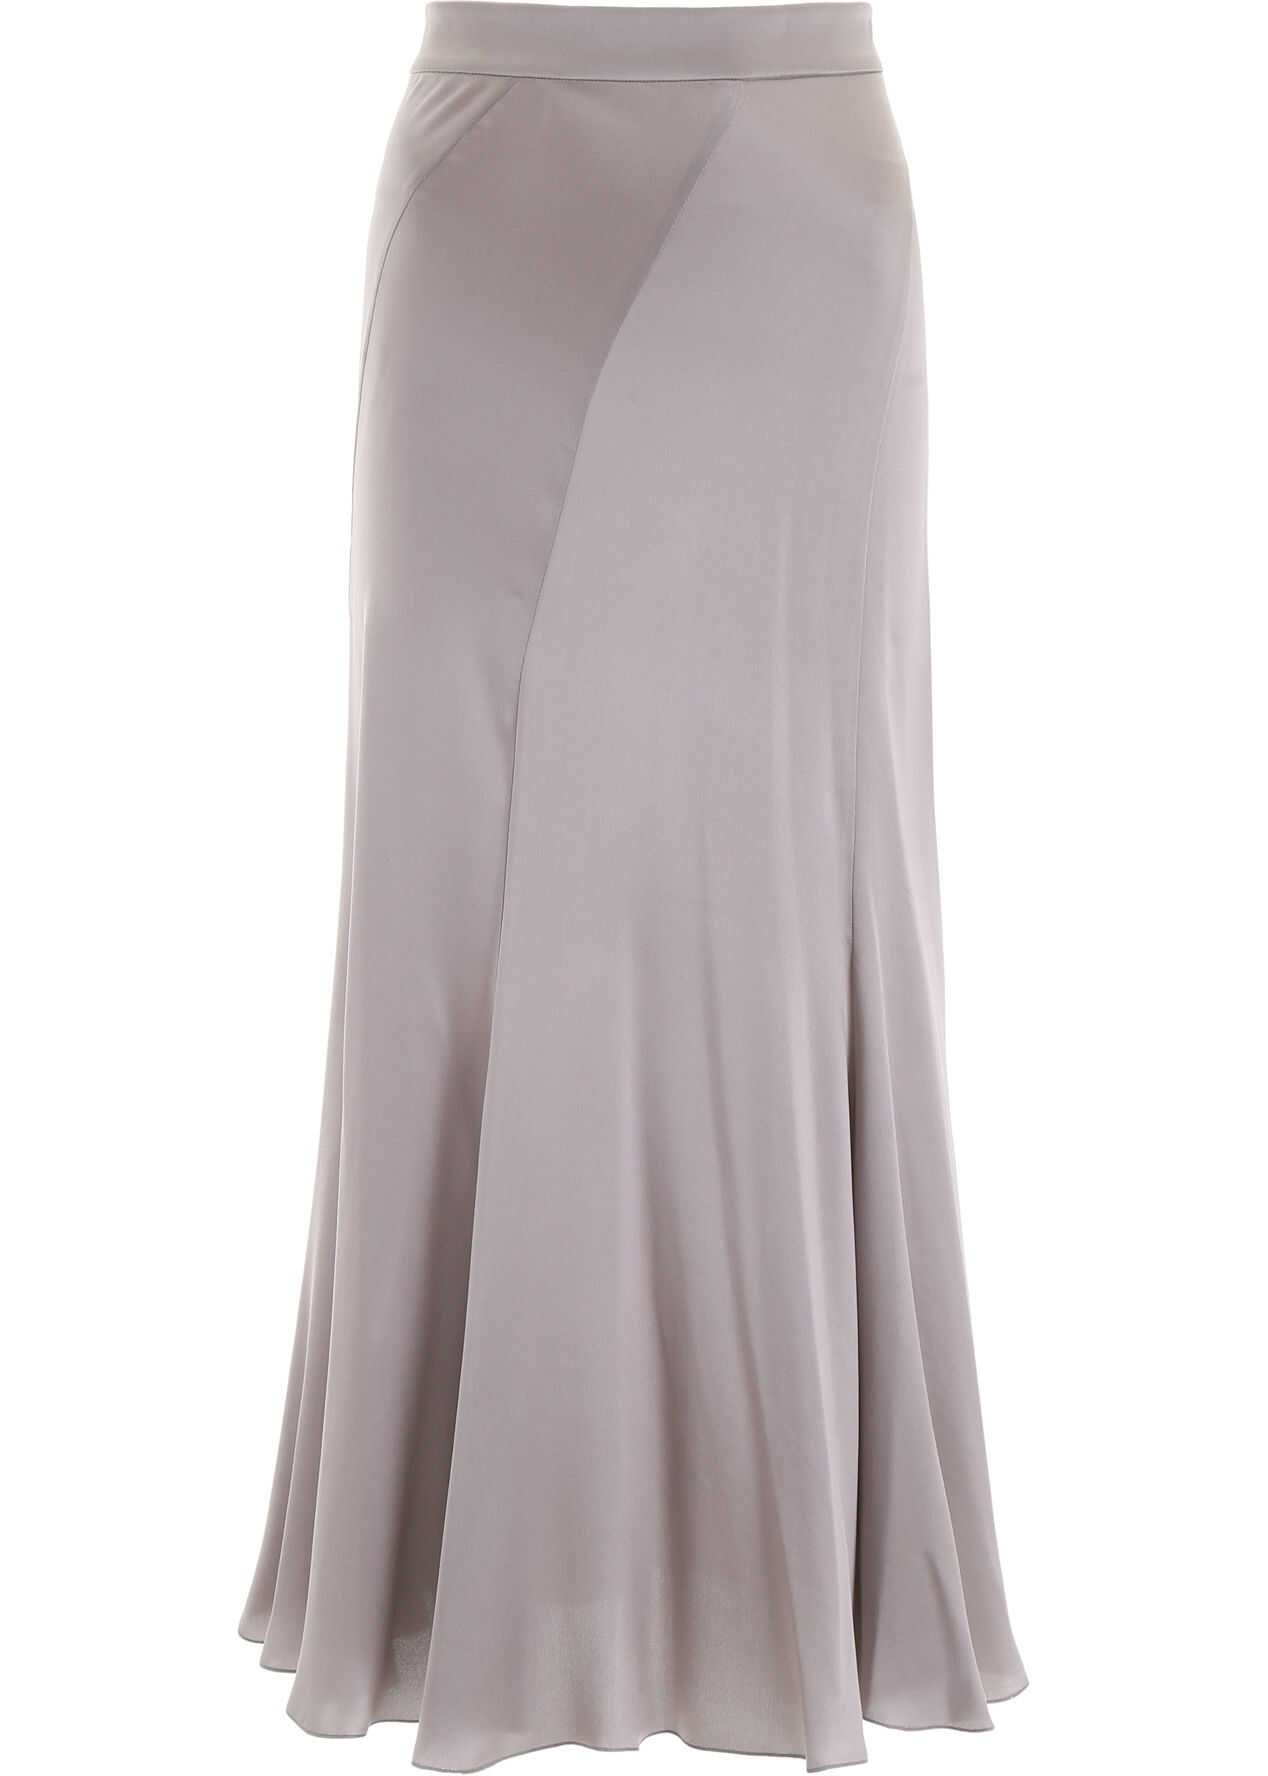 Alberta Ferretti Silk Satin Skirt GREY